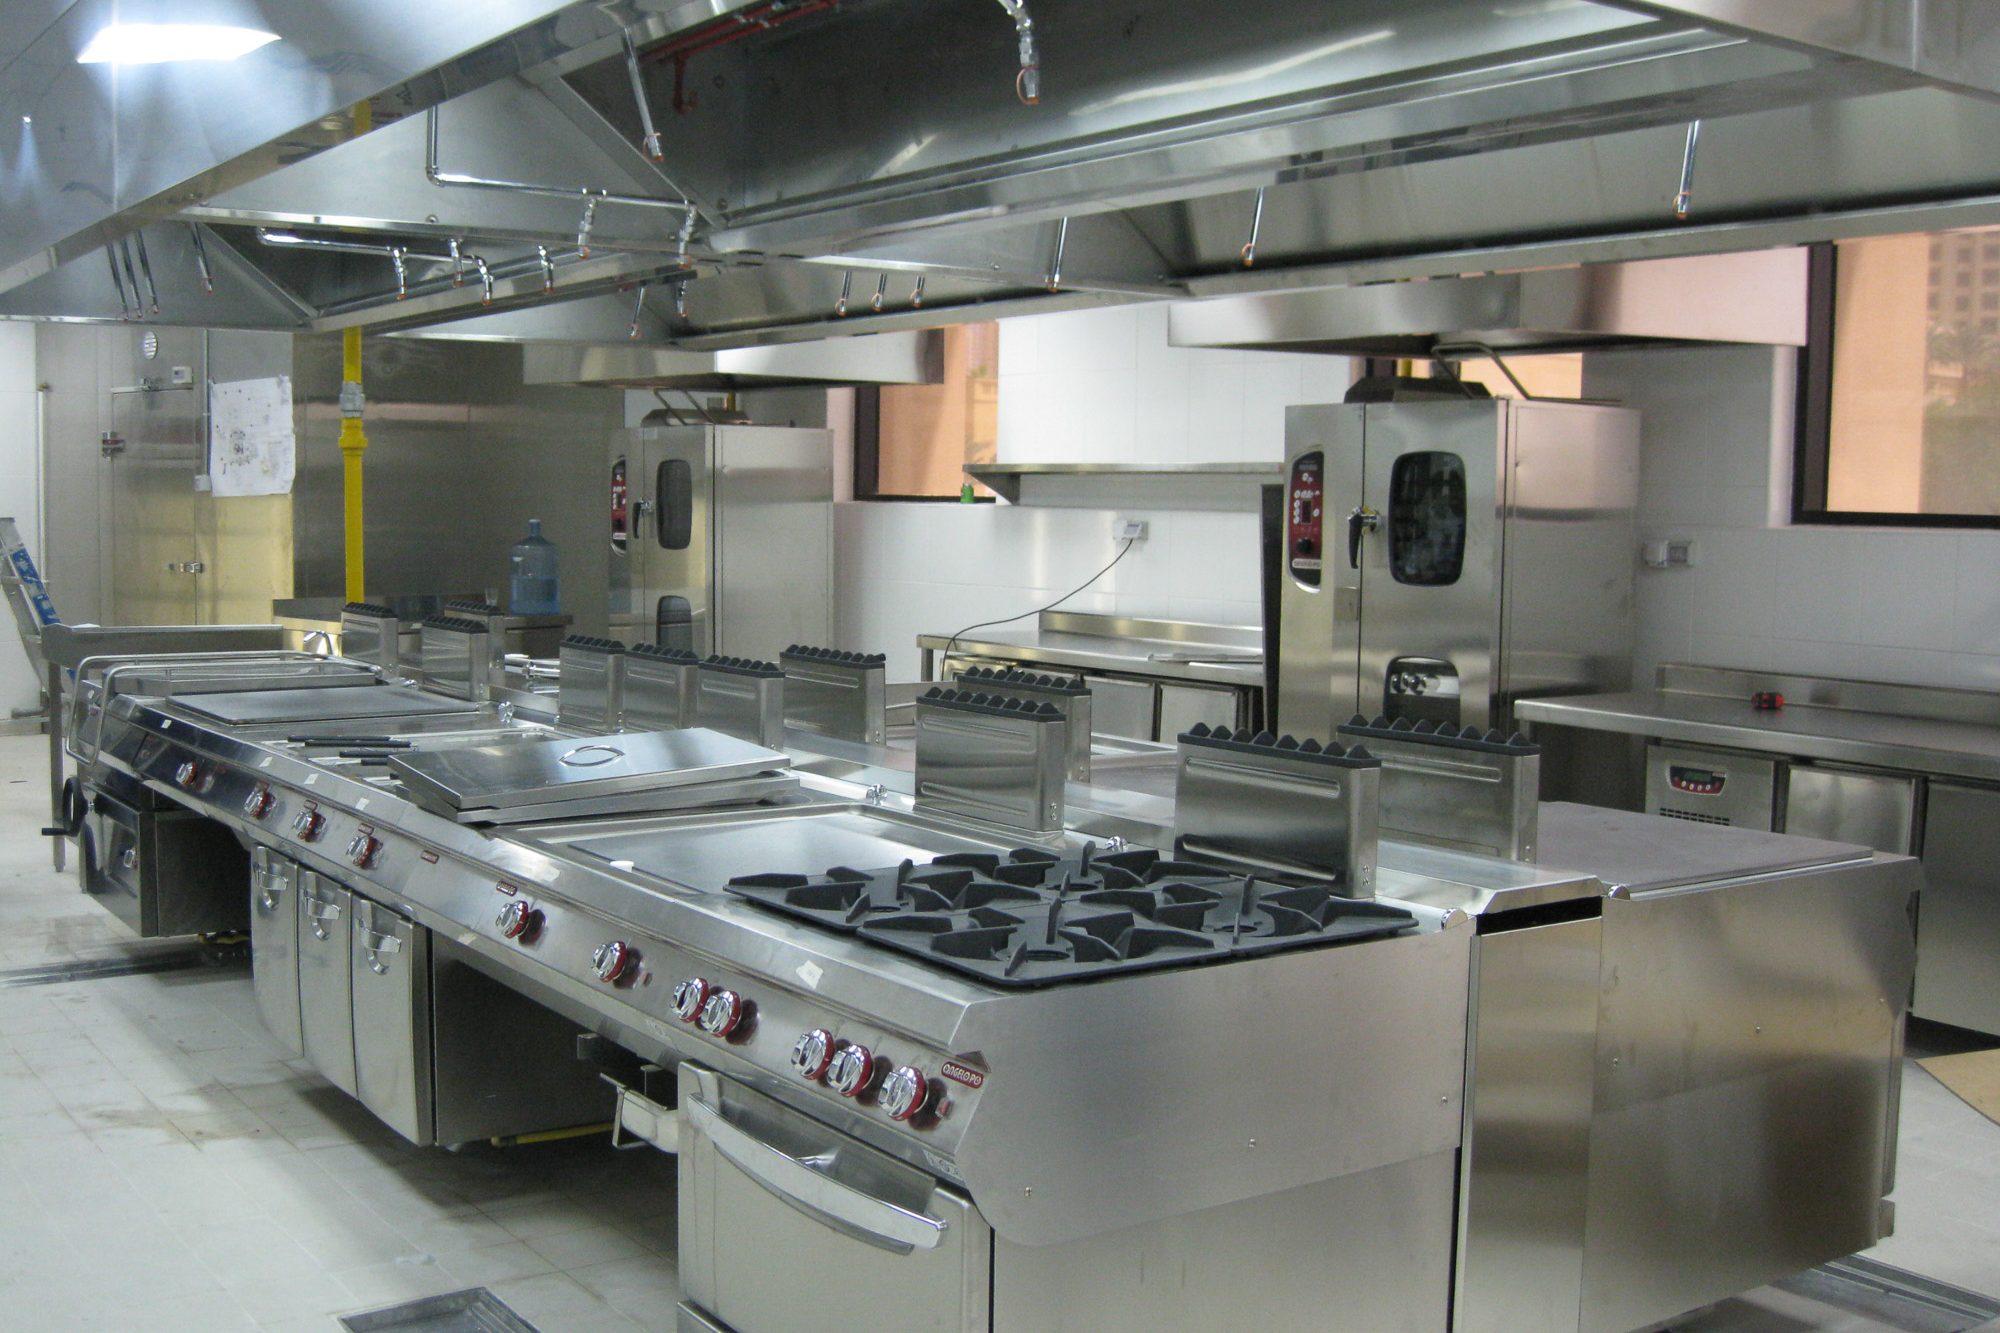 Italia_kitchen_-le_meridien_r-4